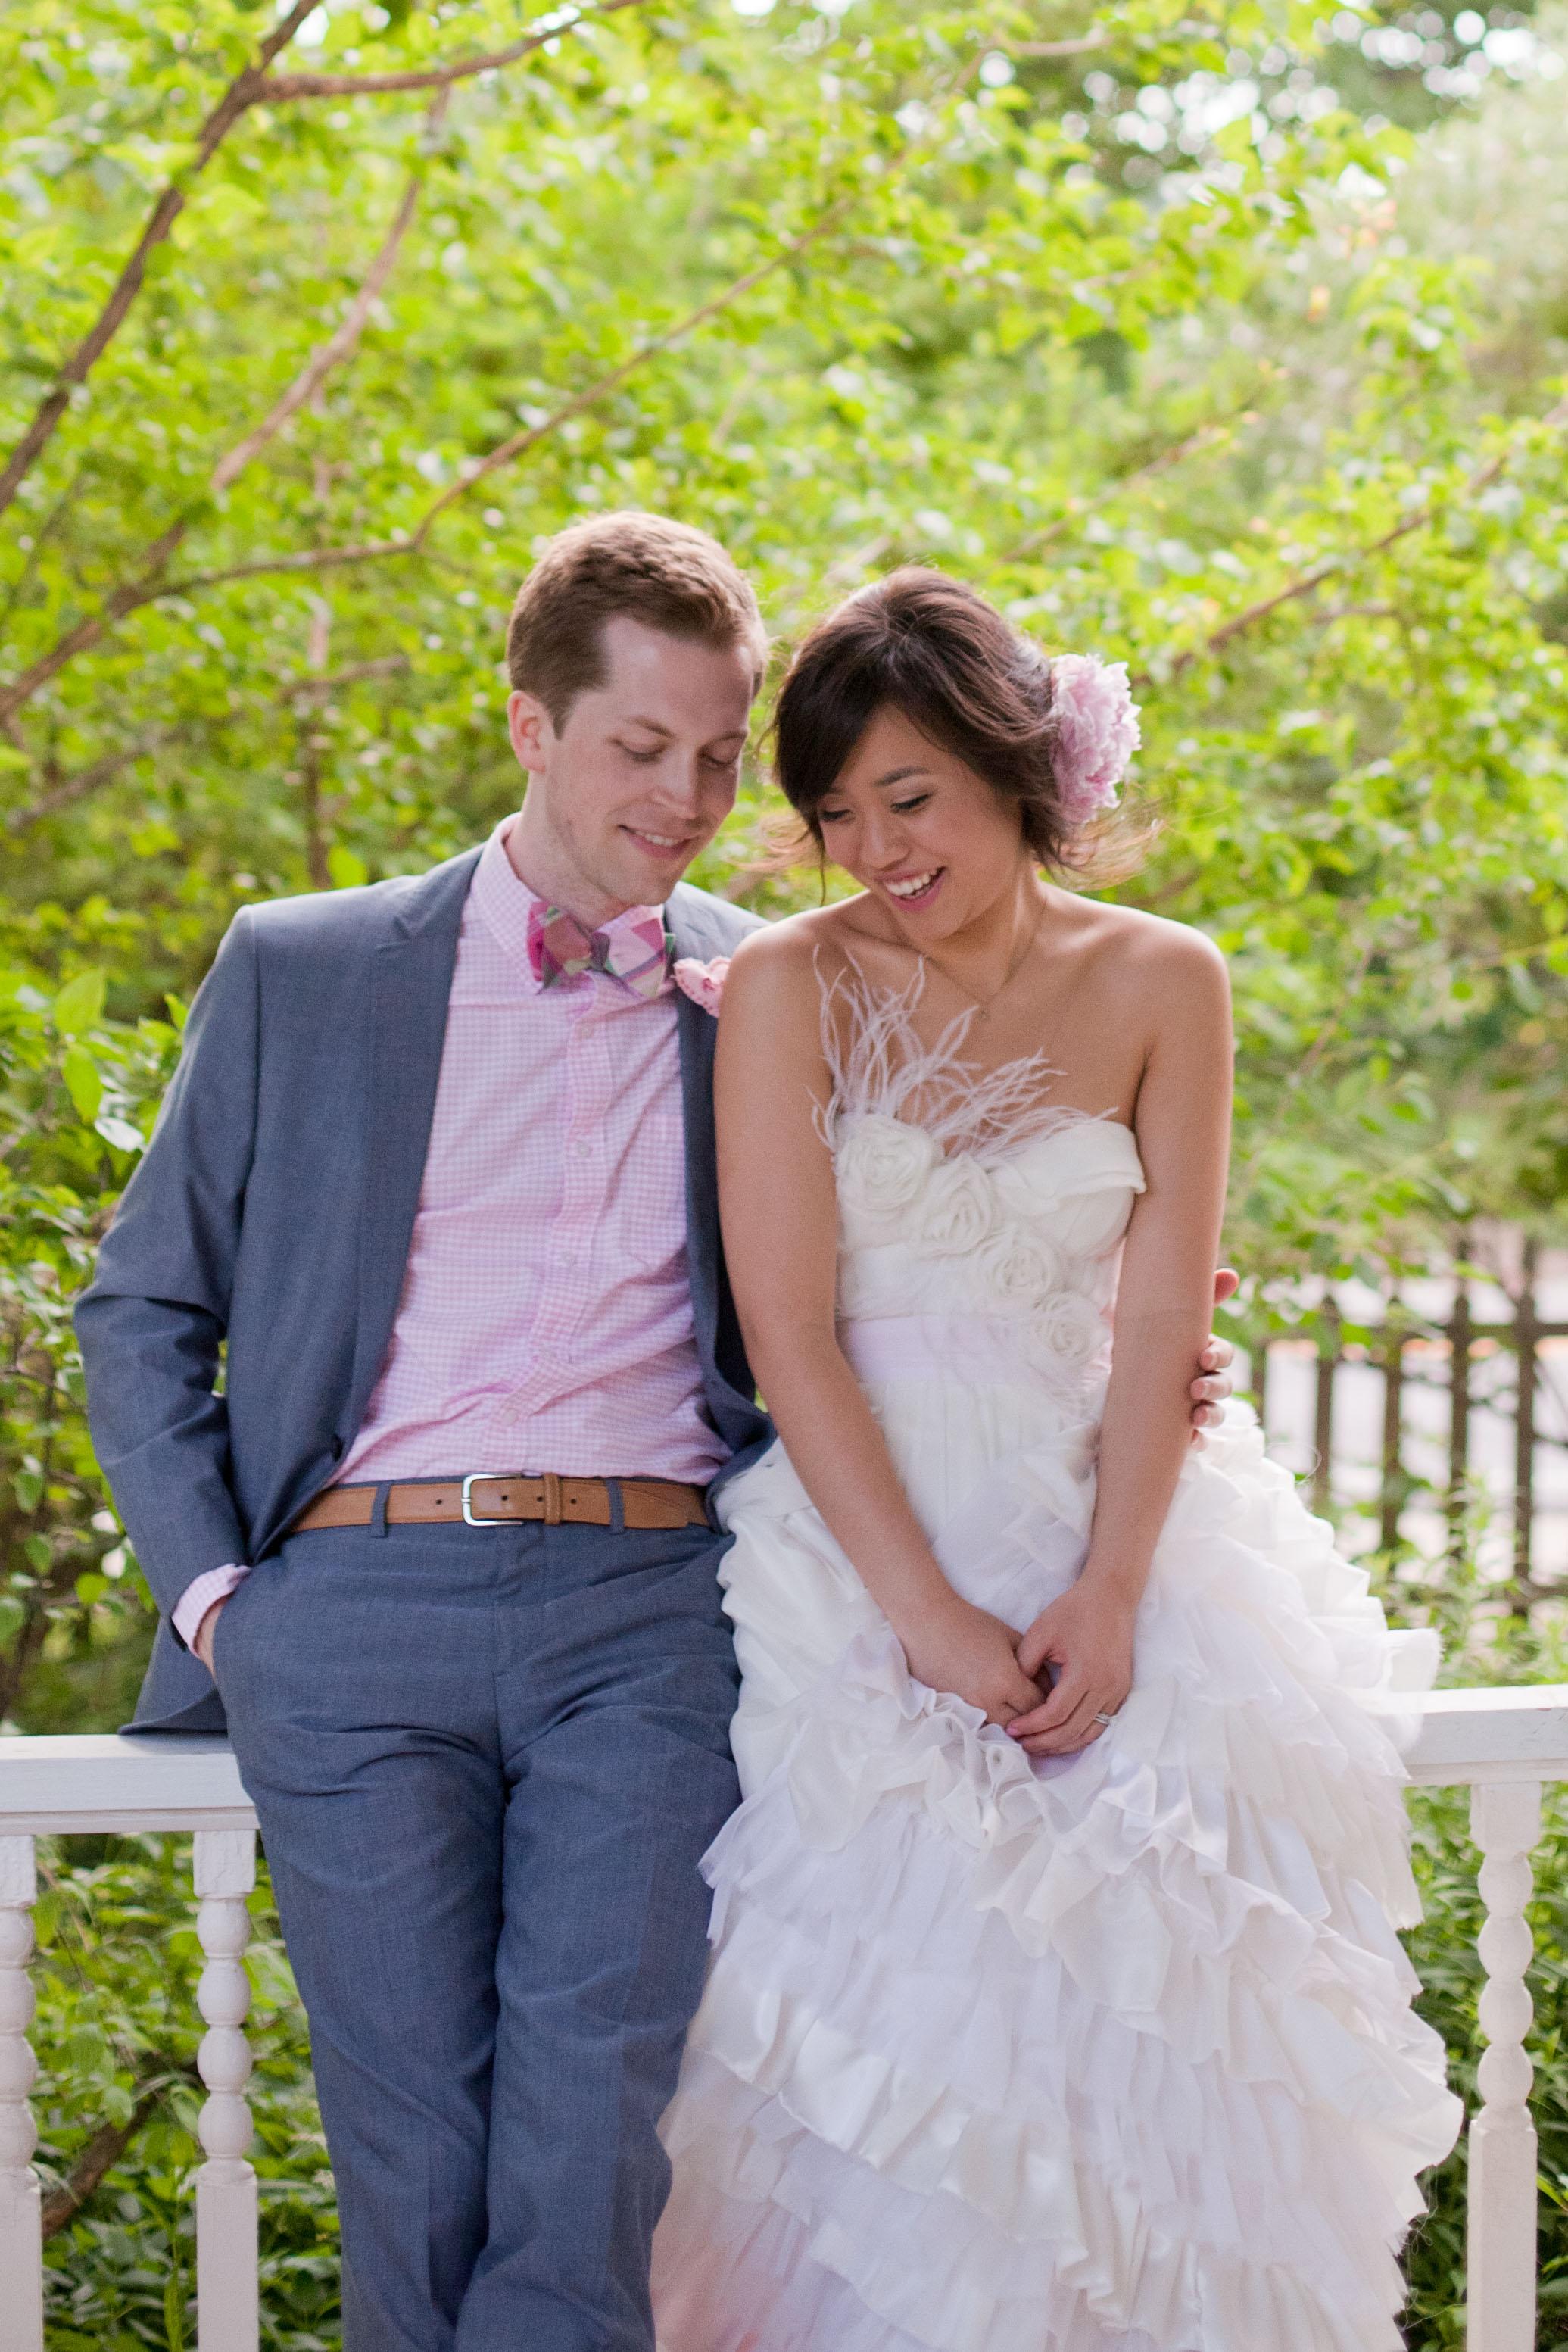 website_wedding (2 of 4).jpg